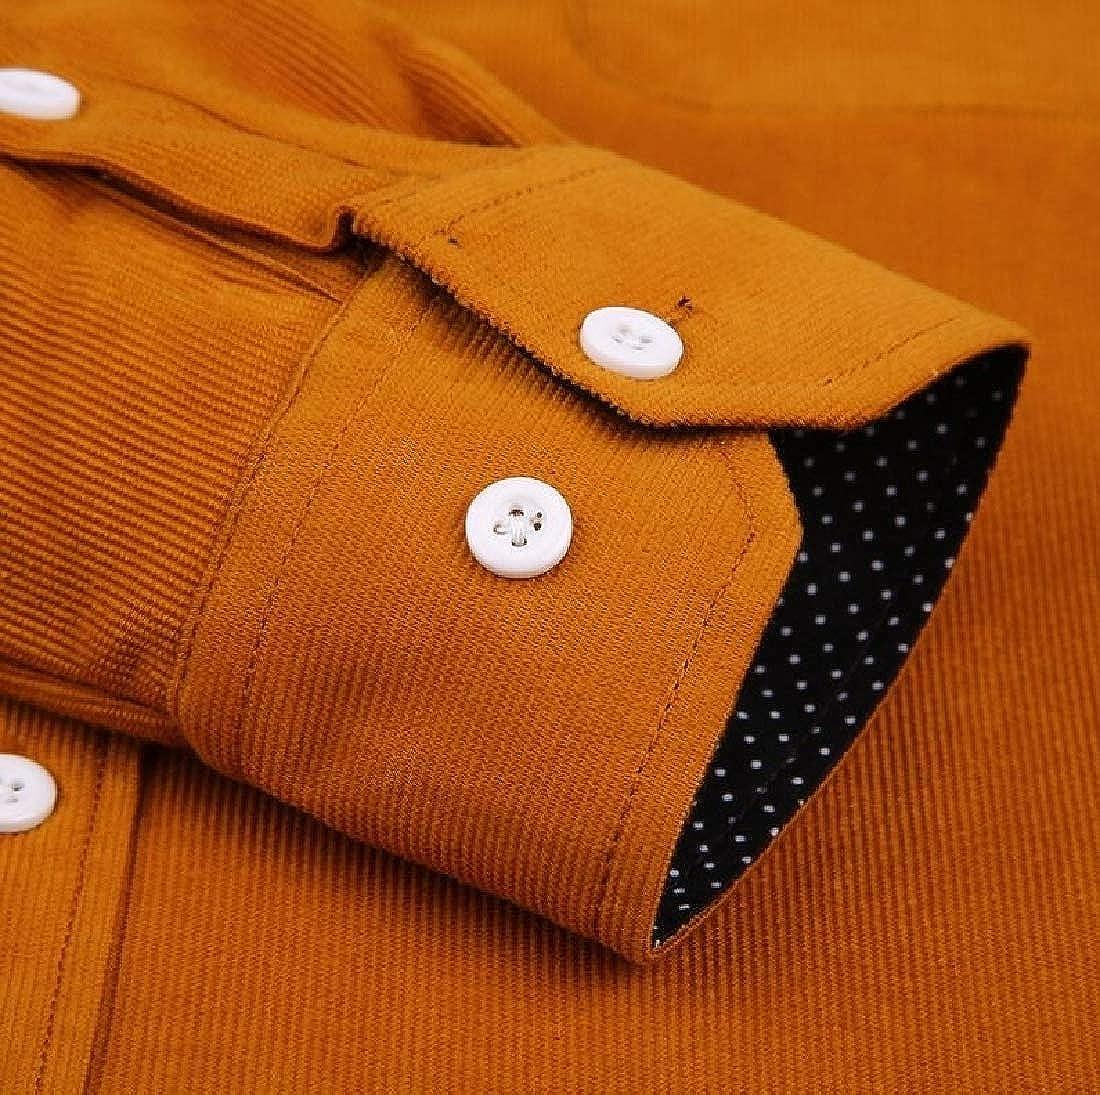 Aooword Mens Button-Down-Shirts Corduroy Big and Tall Woven Dress Shirts